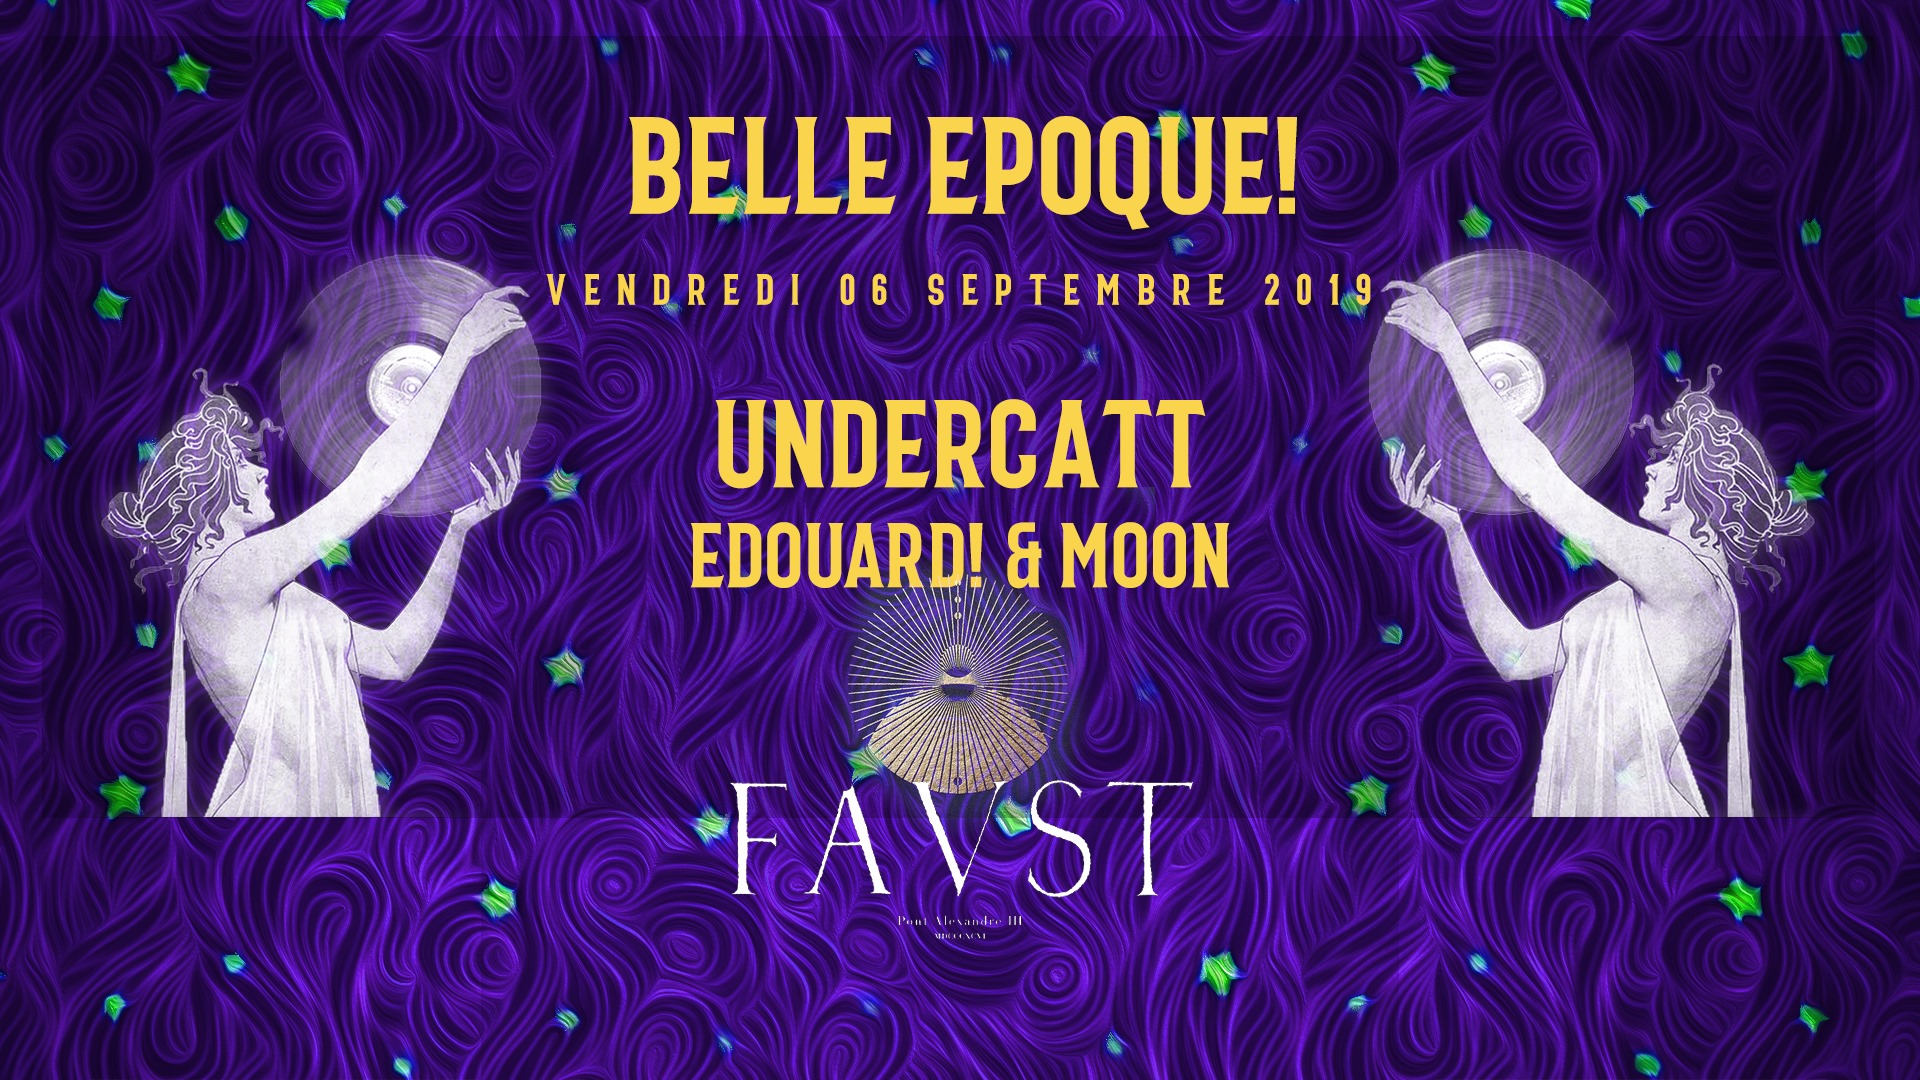 Belle Epoque! w/ Undercatt